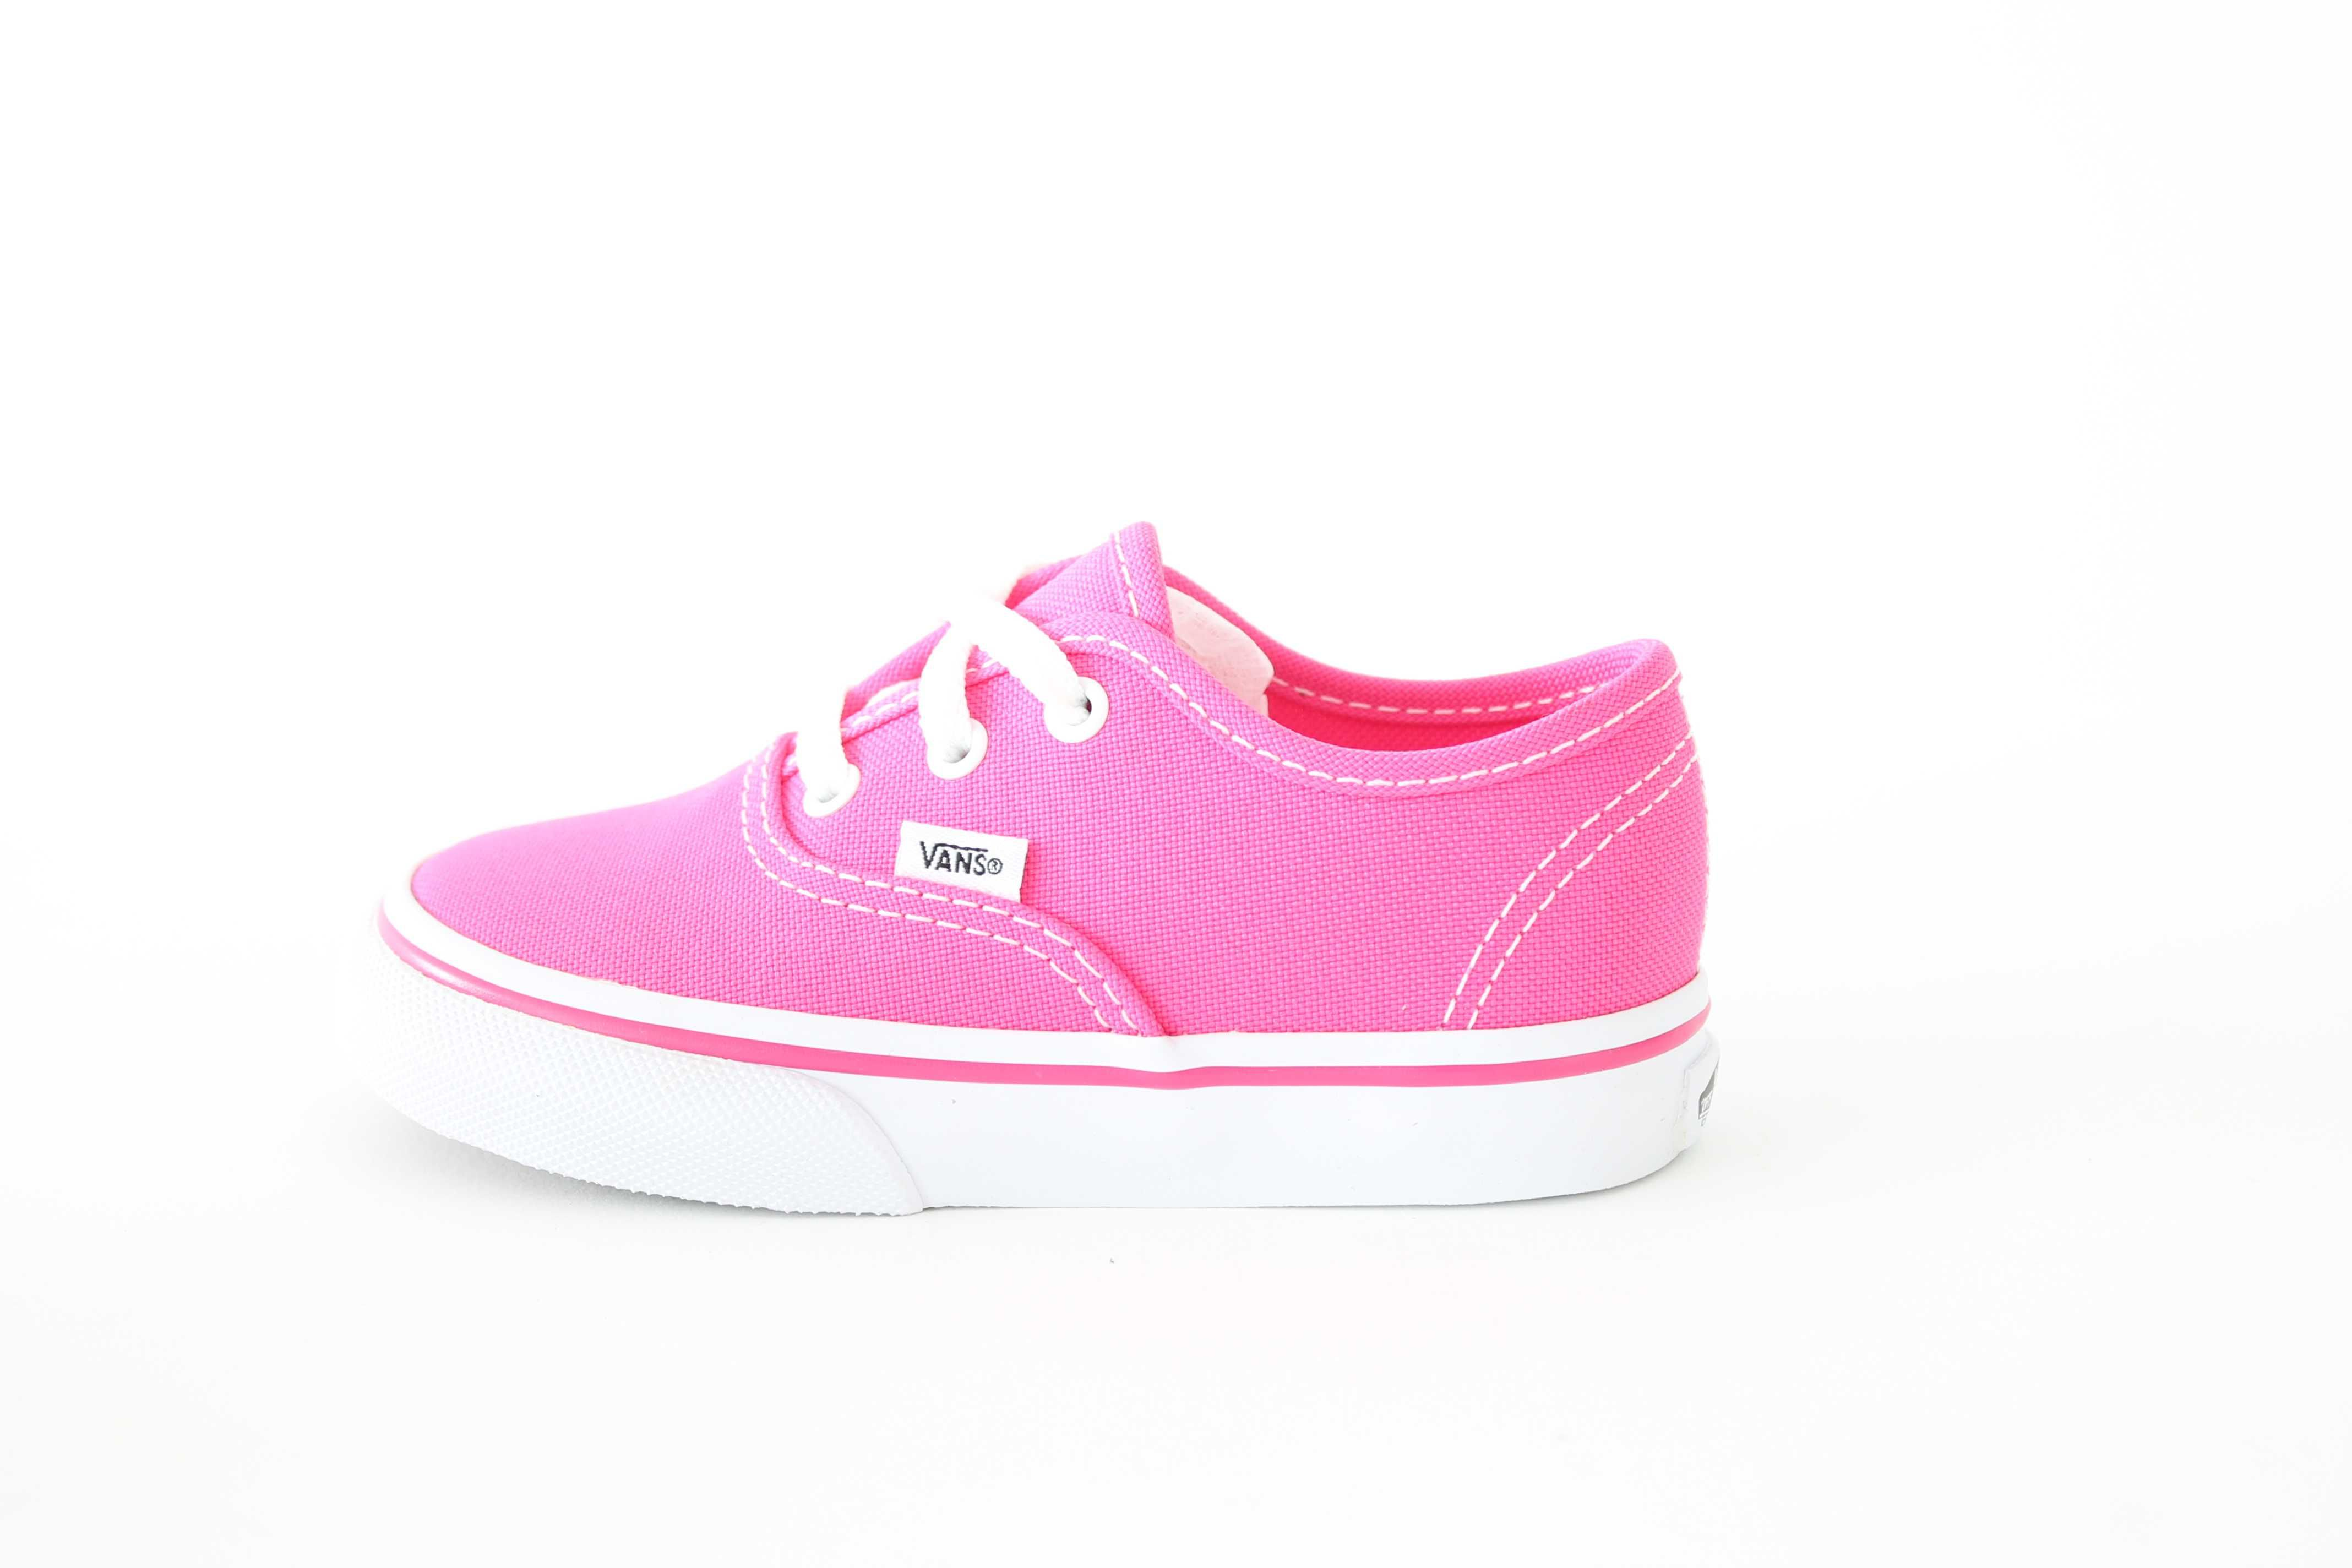 vans niña zapatillas